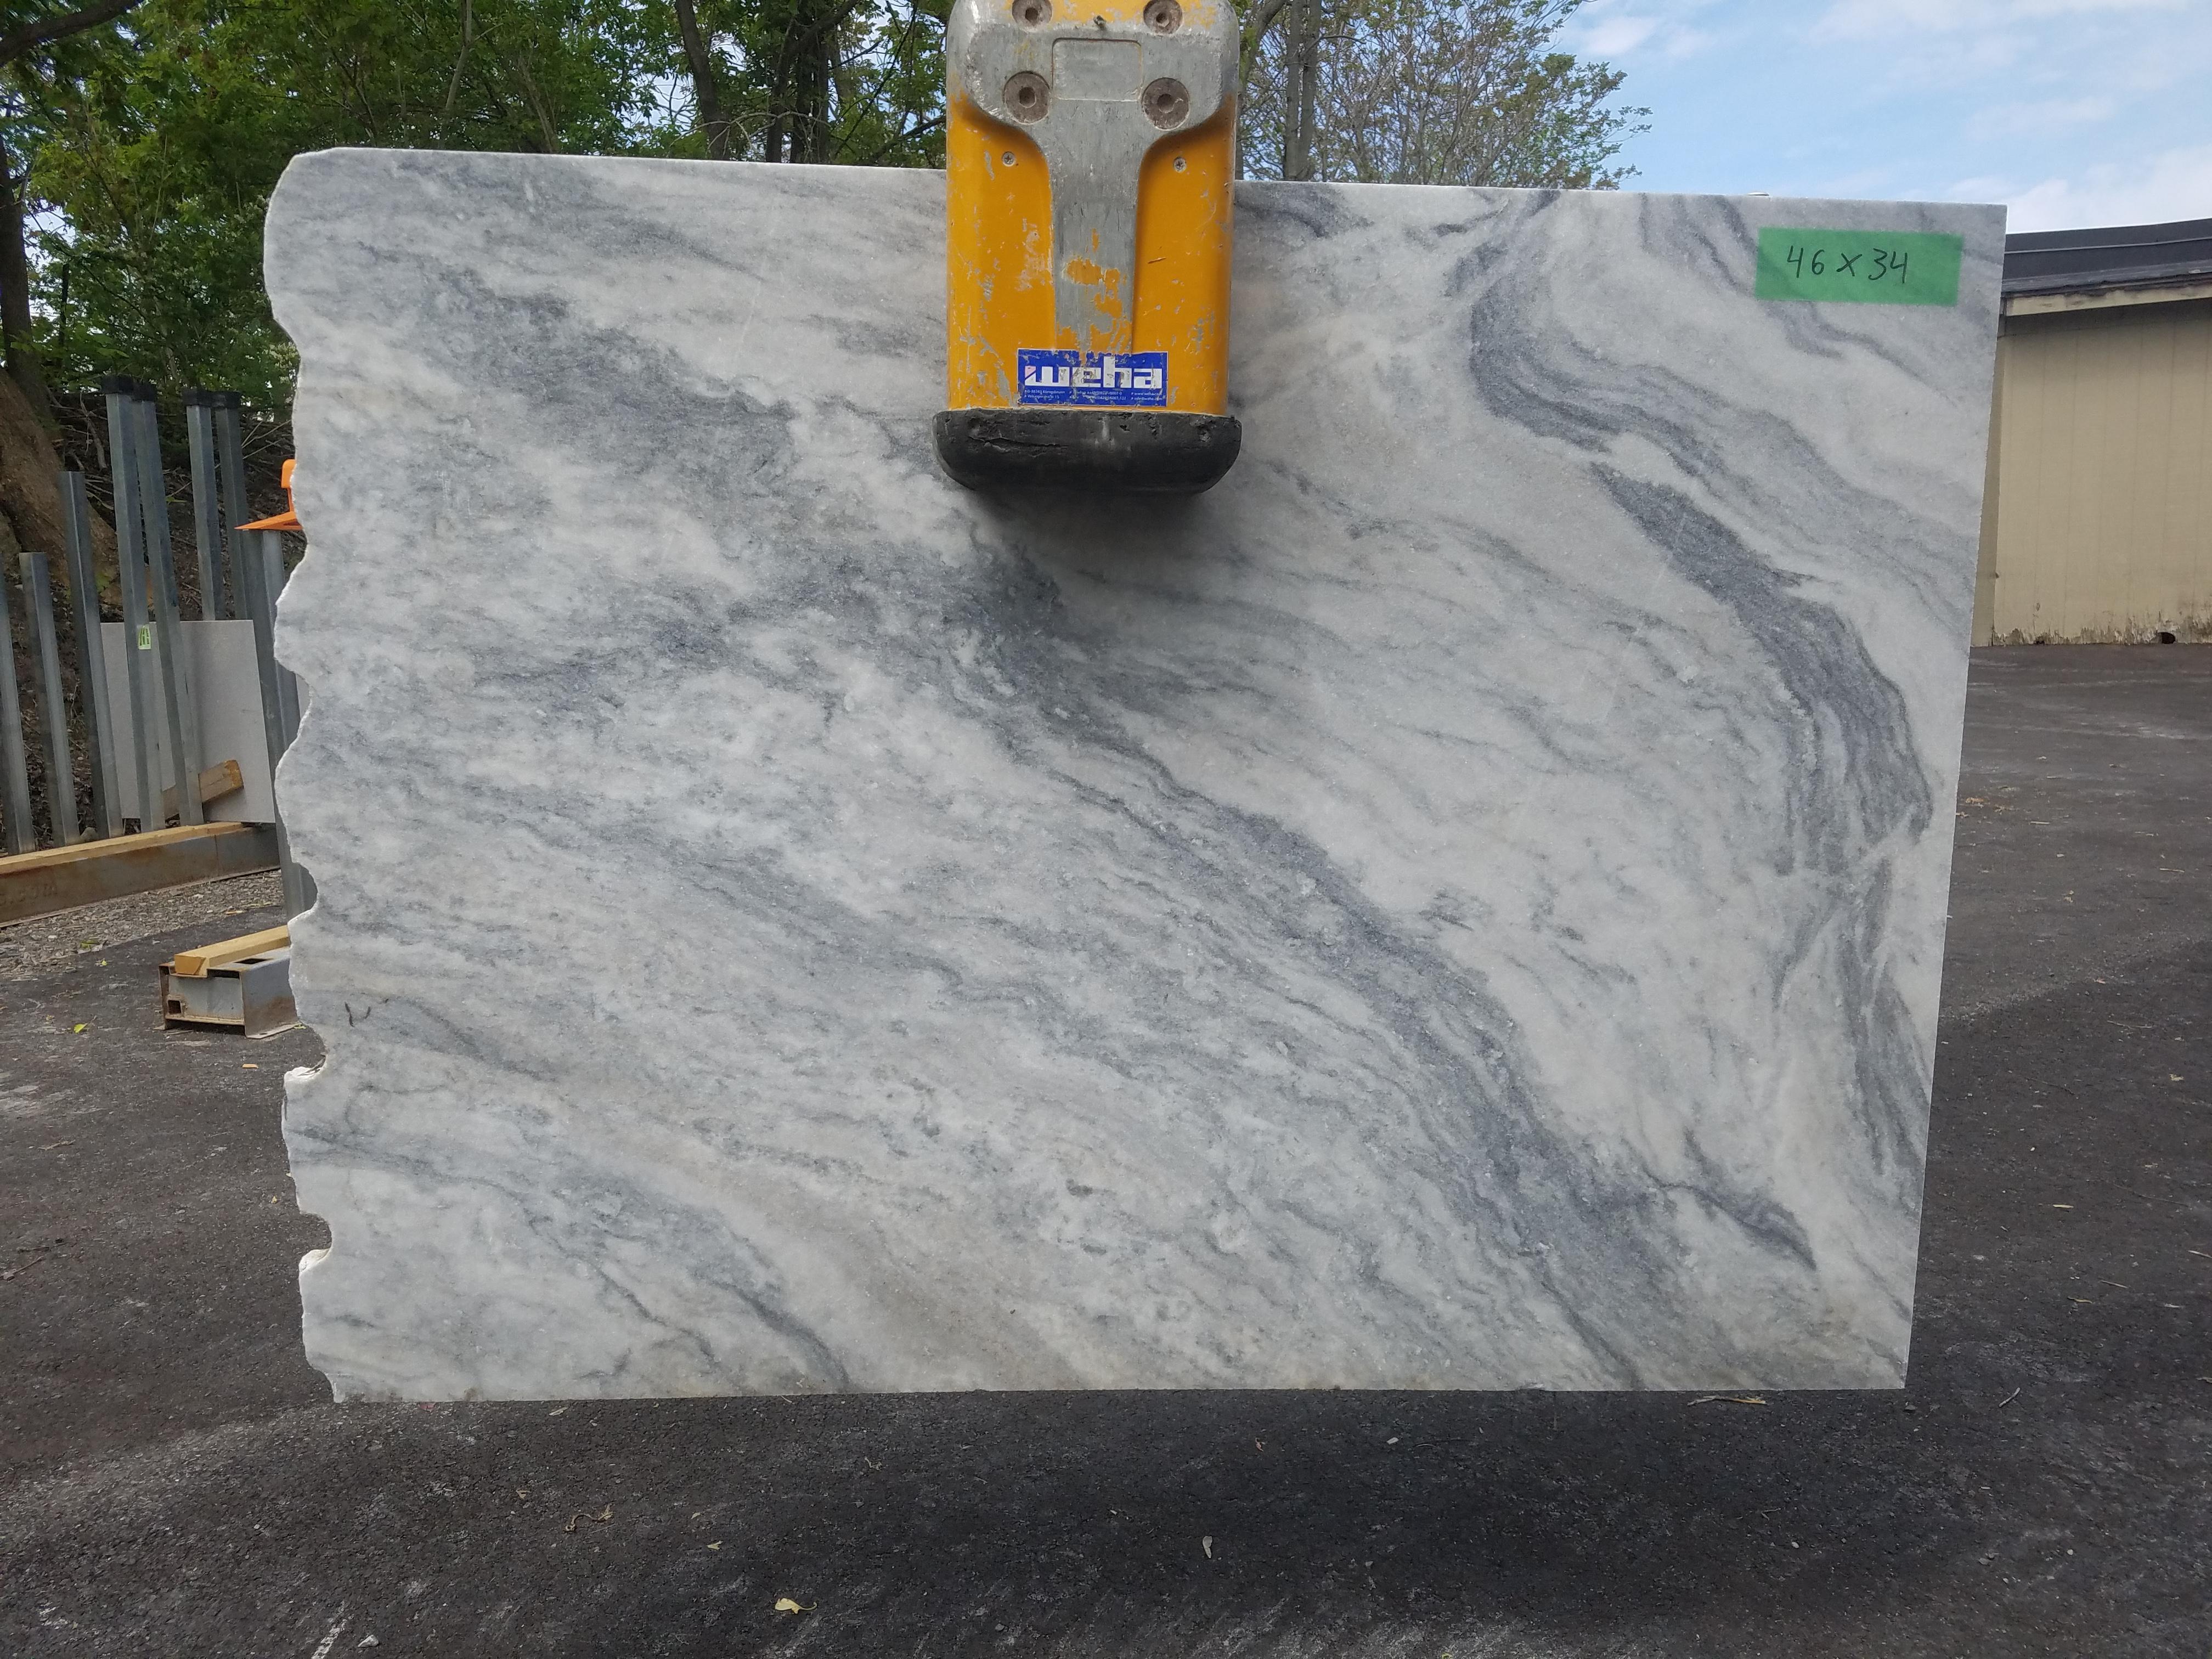 Marble 01 - 46 x 34